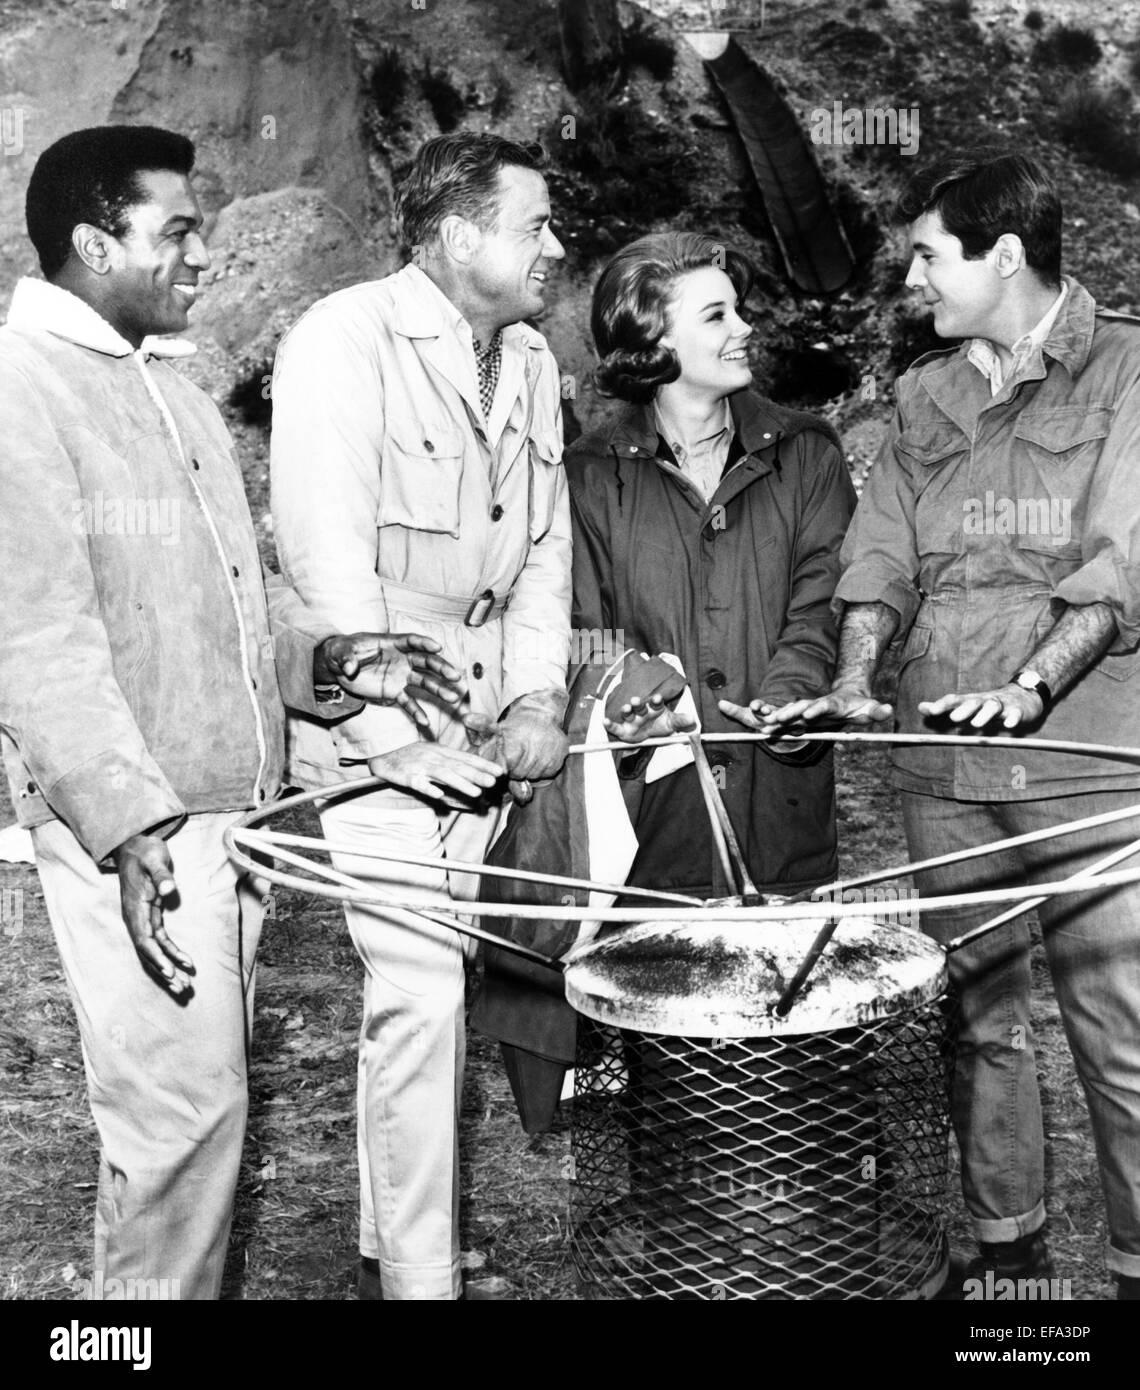 HARI RHODES, MARSHALL THOMPSON, CHERYL MILLER, YALE SUMMERS, DAKTARI, 1966 - Stock Image